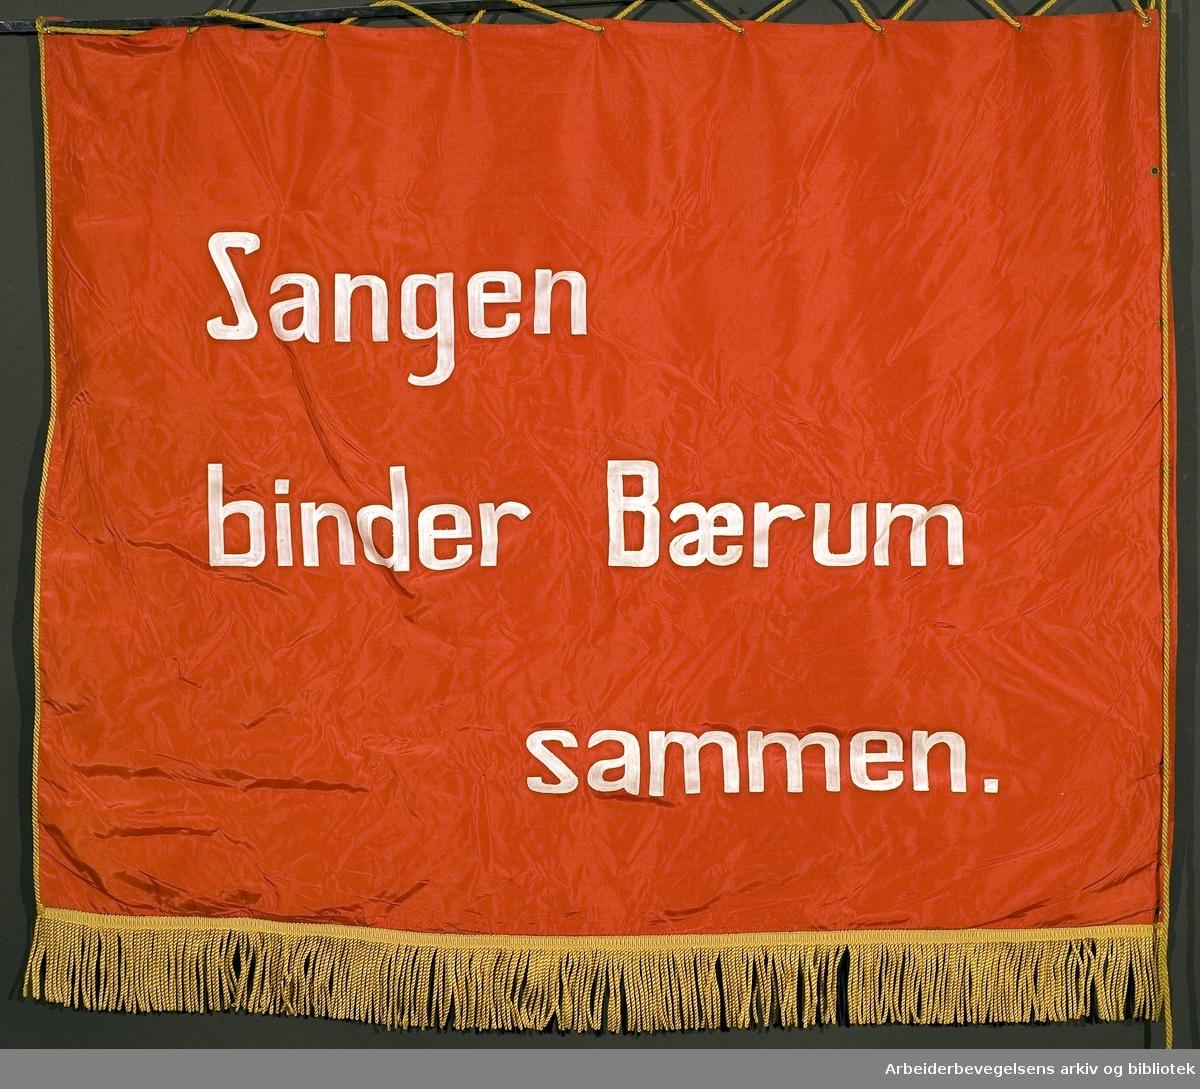 Bærum arbeiderpartis kor.Stiftet 16. september 1951..Bakside..Fanetekst: Sangen binder Bærum sammen...